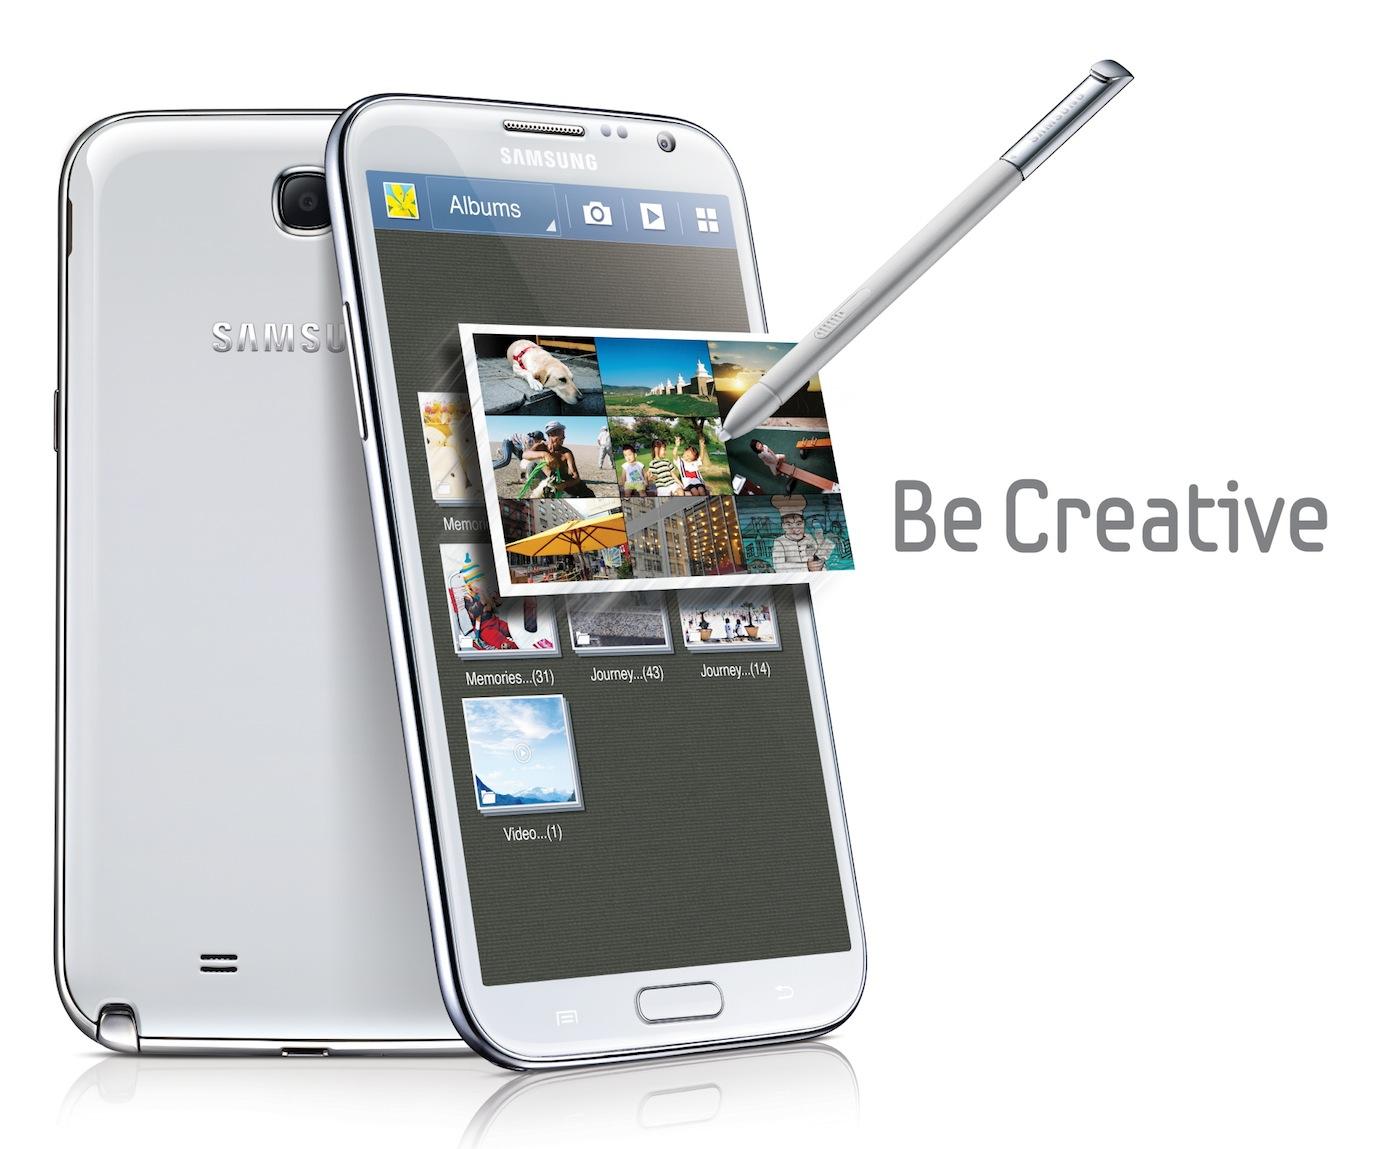 http://1.bp.blogspot.com/-suMXSo8Z3sg/UJHuAm09kRI/AAAAAAAABXU/iCNkXLSetTs/s1600/n7100-Galaxy-Note2.jpg